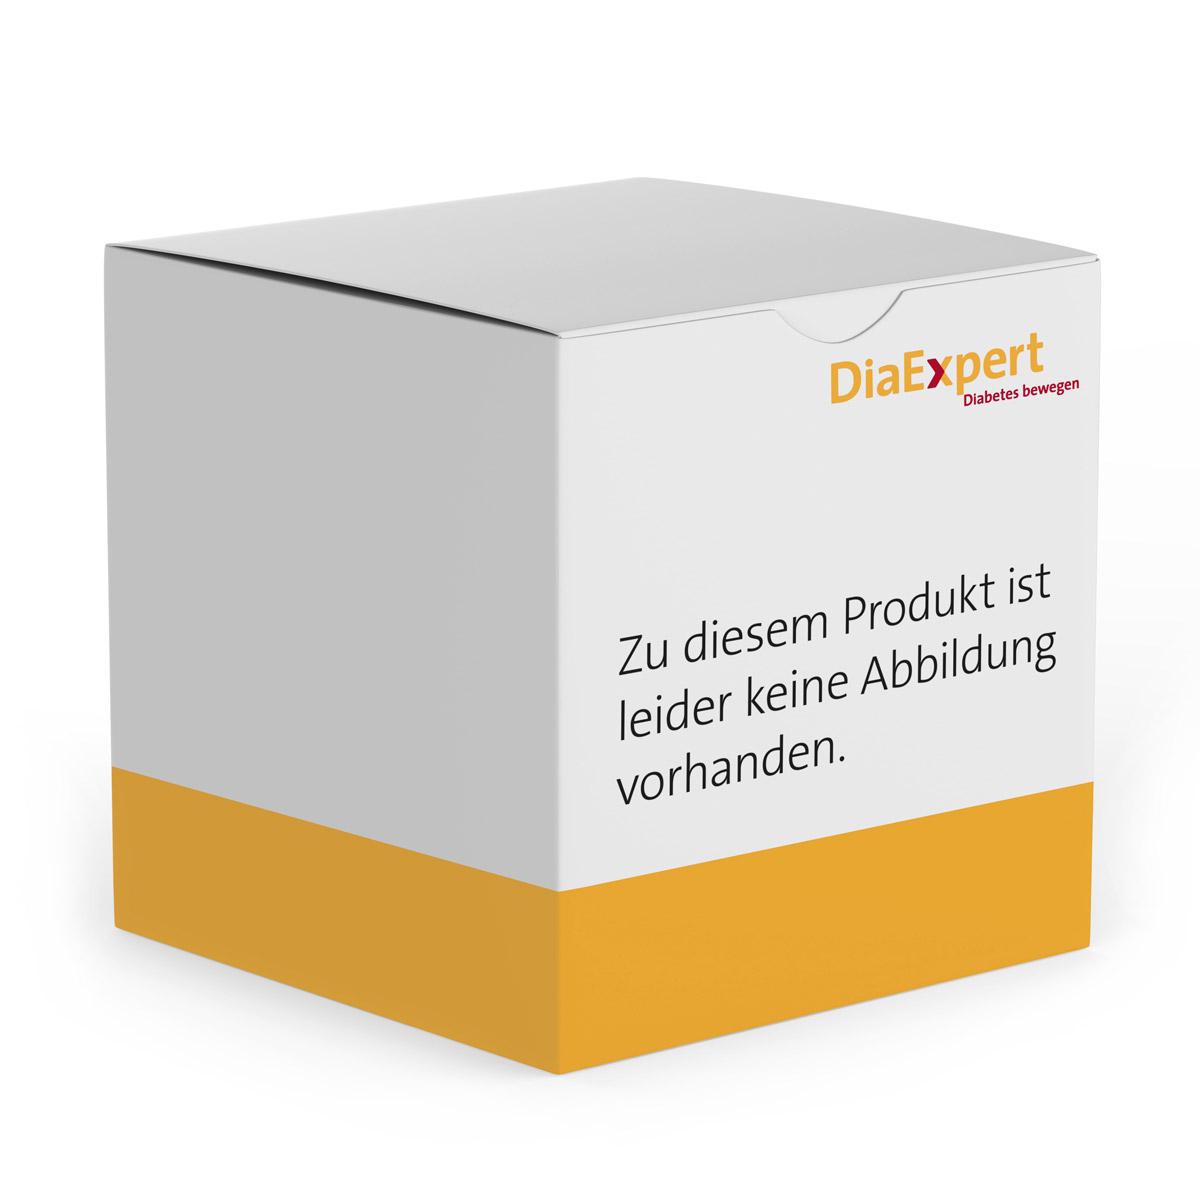 OneTouch Ultra Plus Flex Set mmol/L